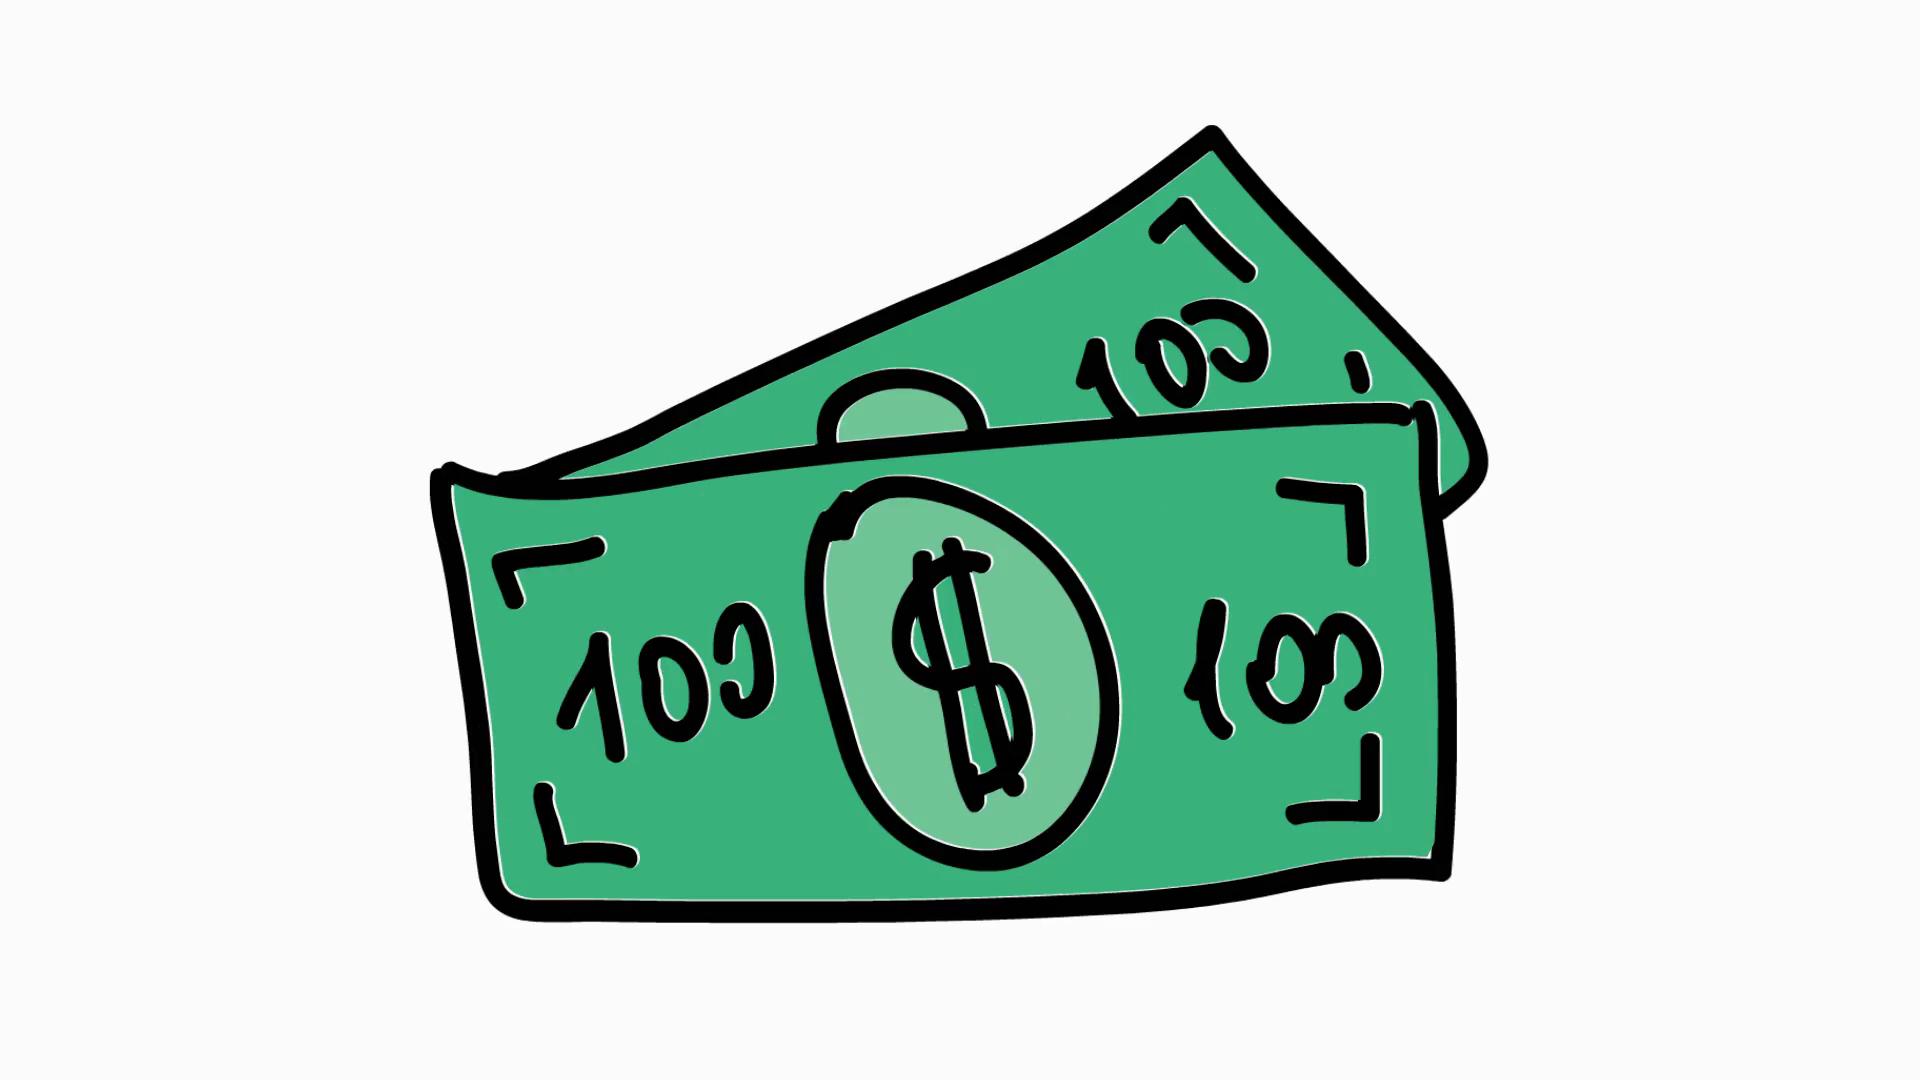 Dollar bill icon cartoon. Bills clipart transparent